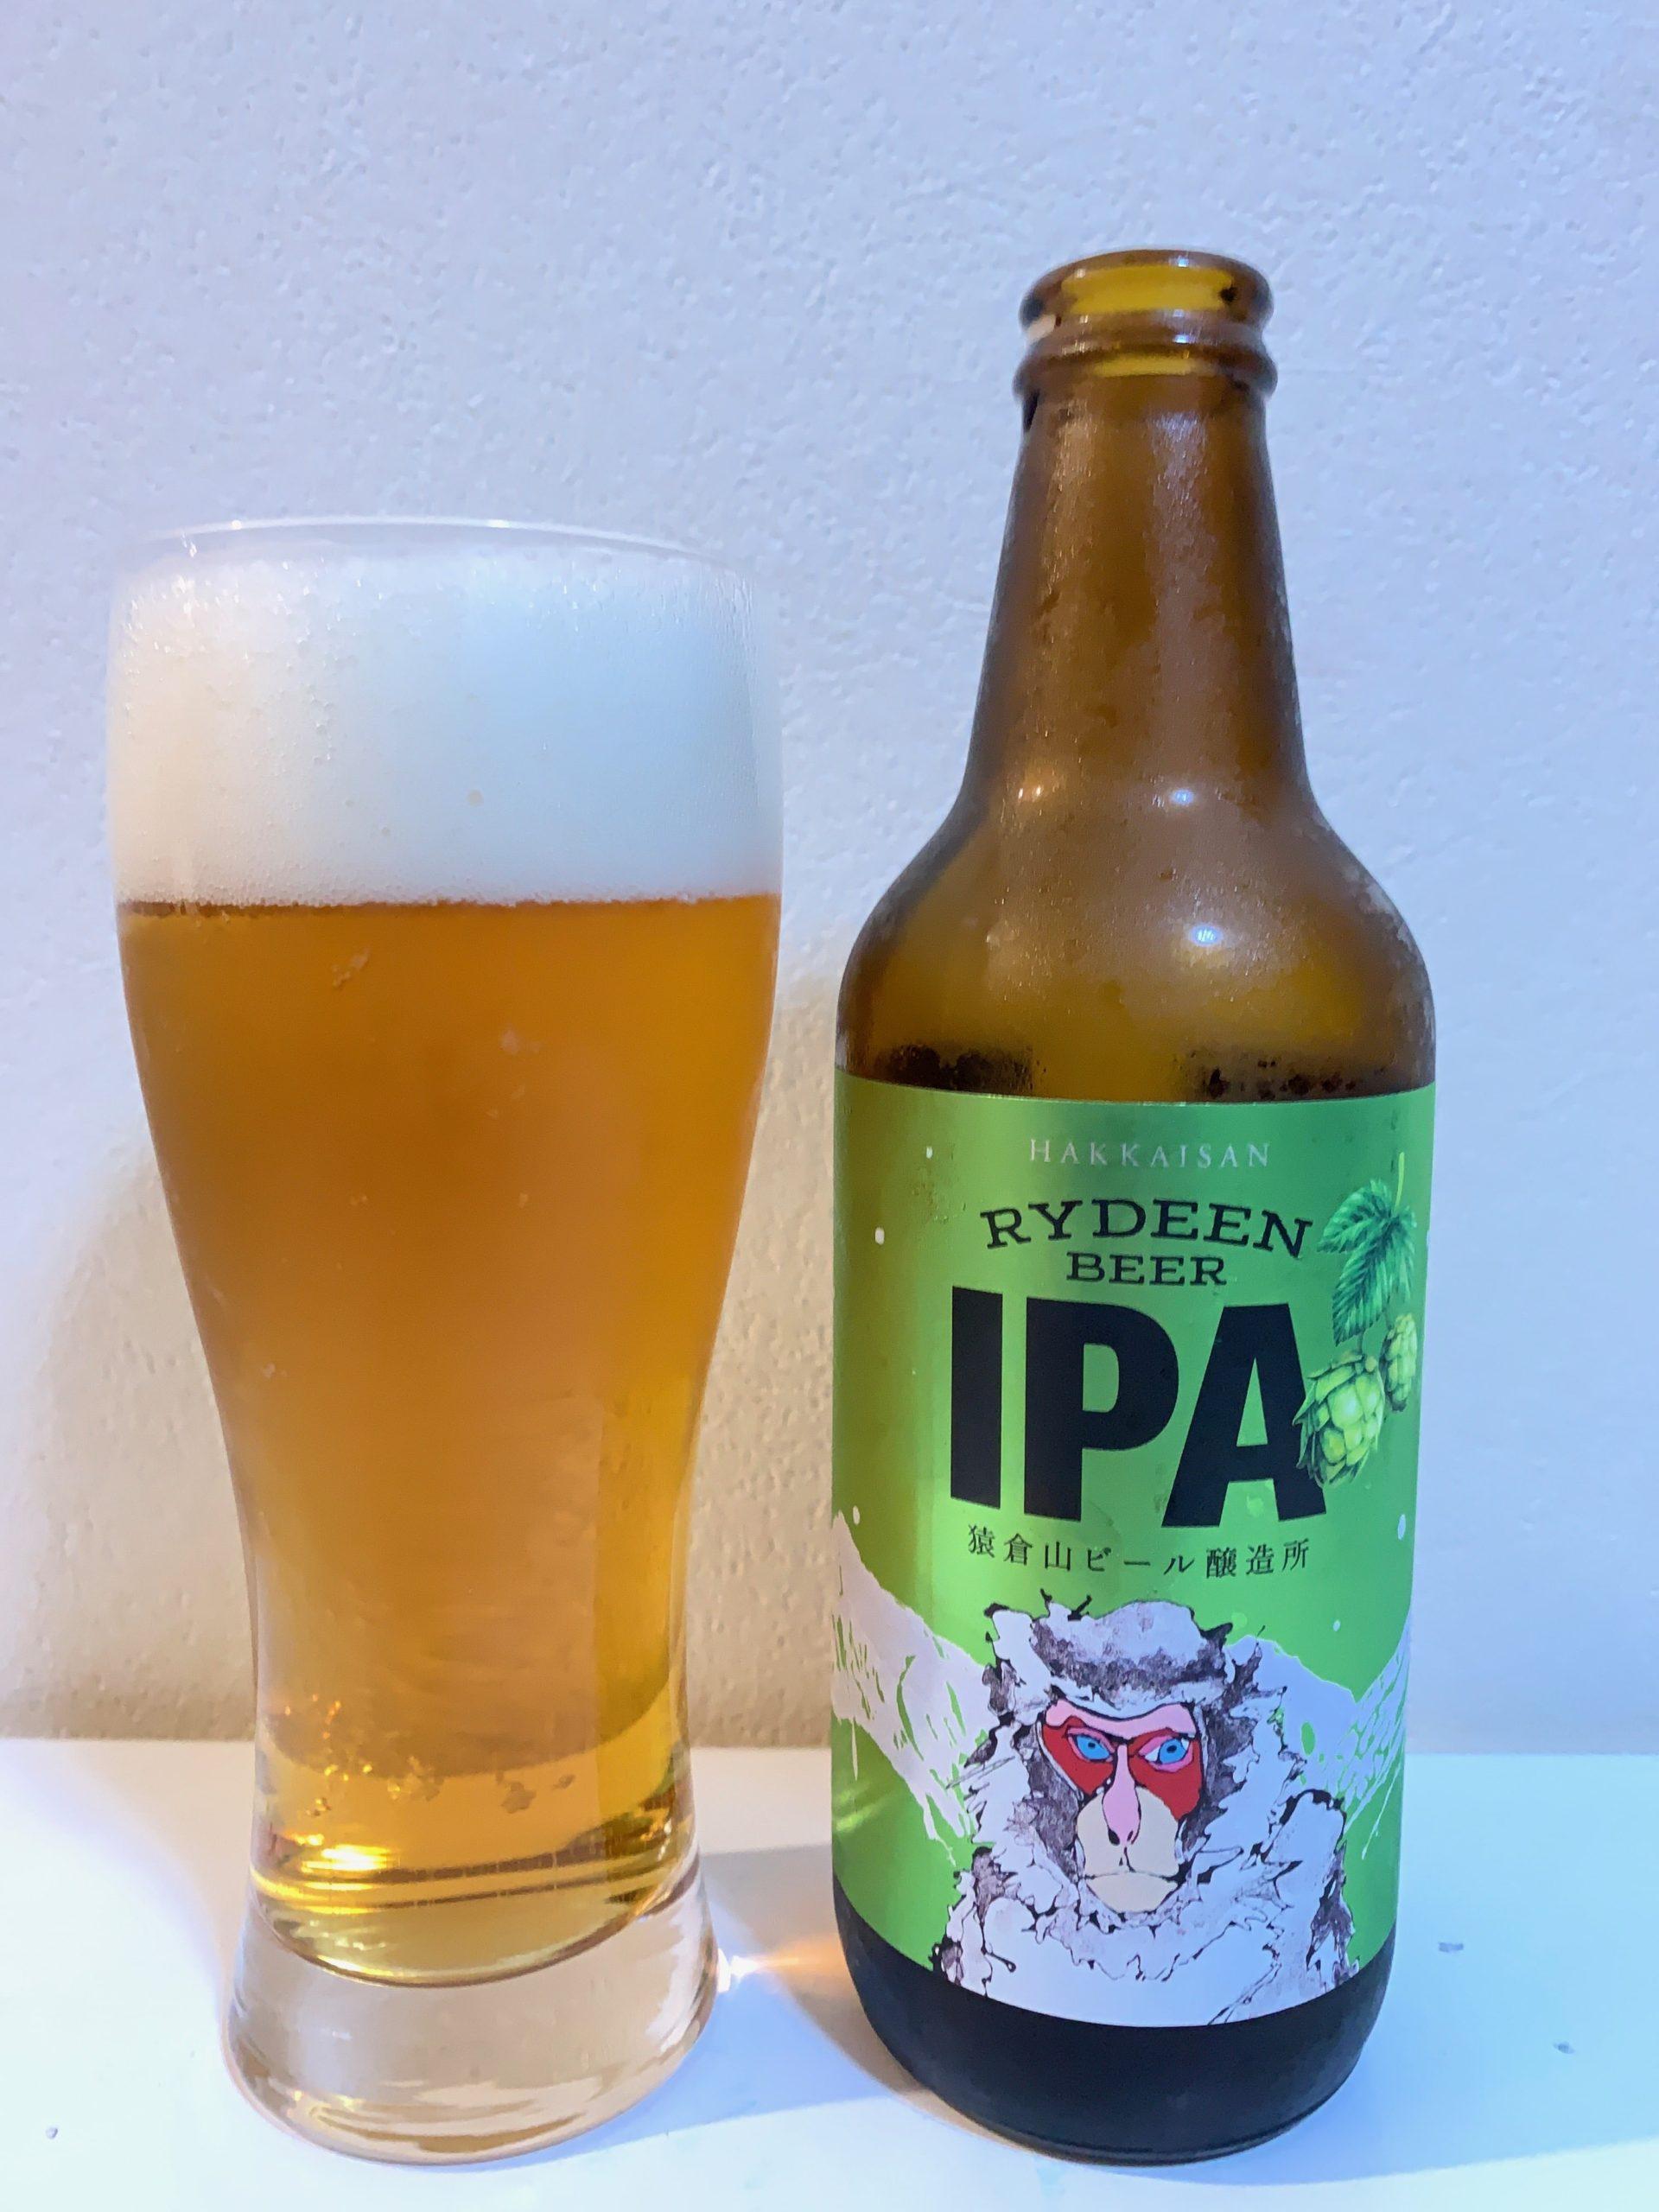 HAKKAISAN RYDEEN BEER IPA(ライディーン ビール IPA)